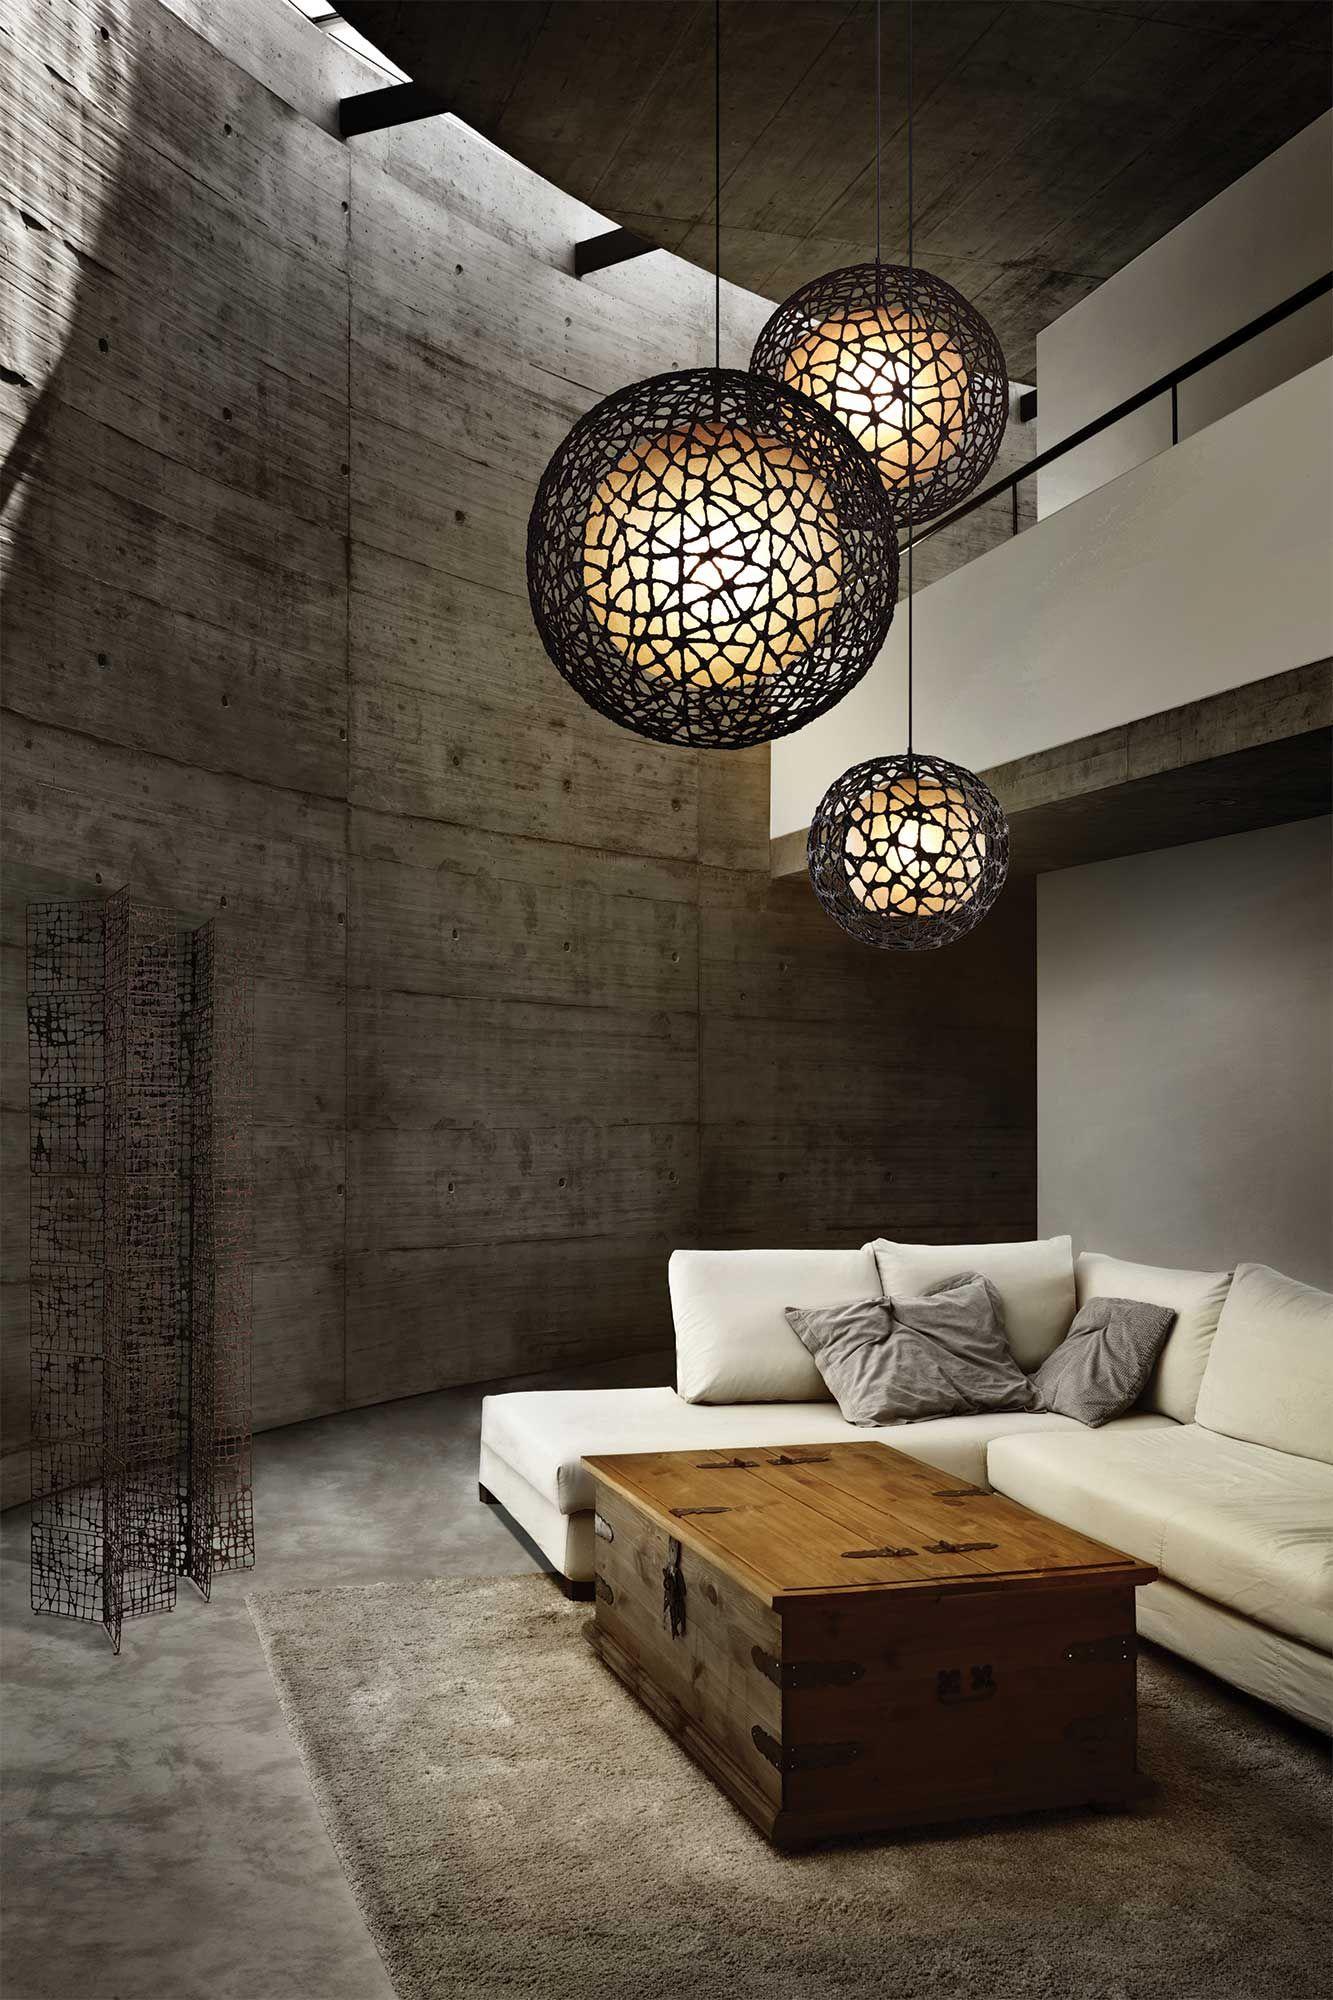 C U C Me Round Pendant By Hive Lpcc 1515 Rustic Living Room